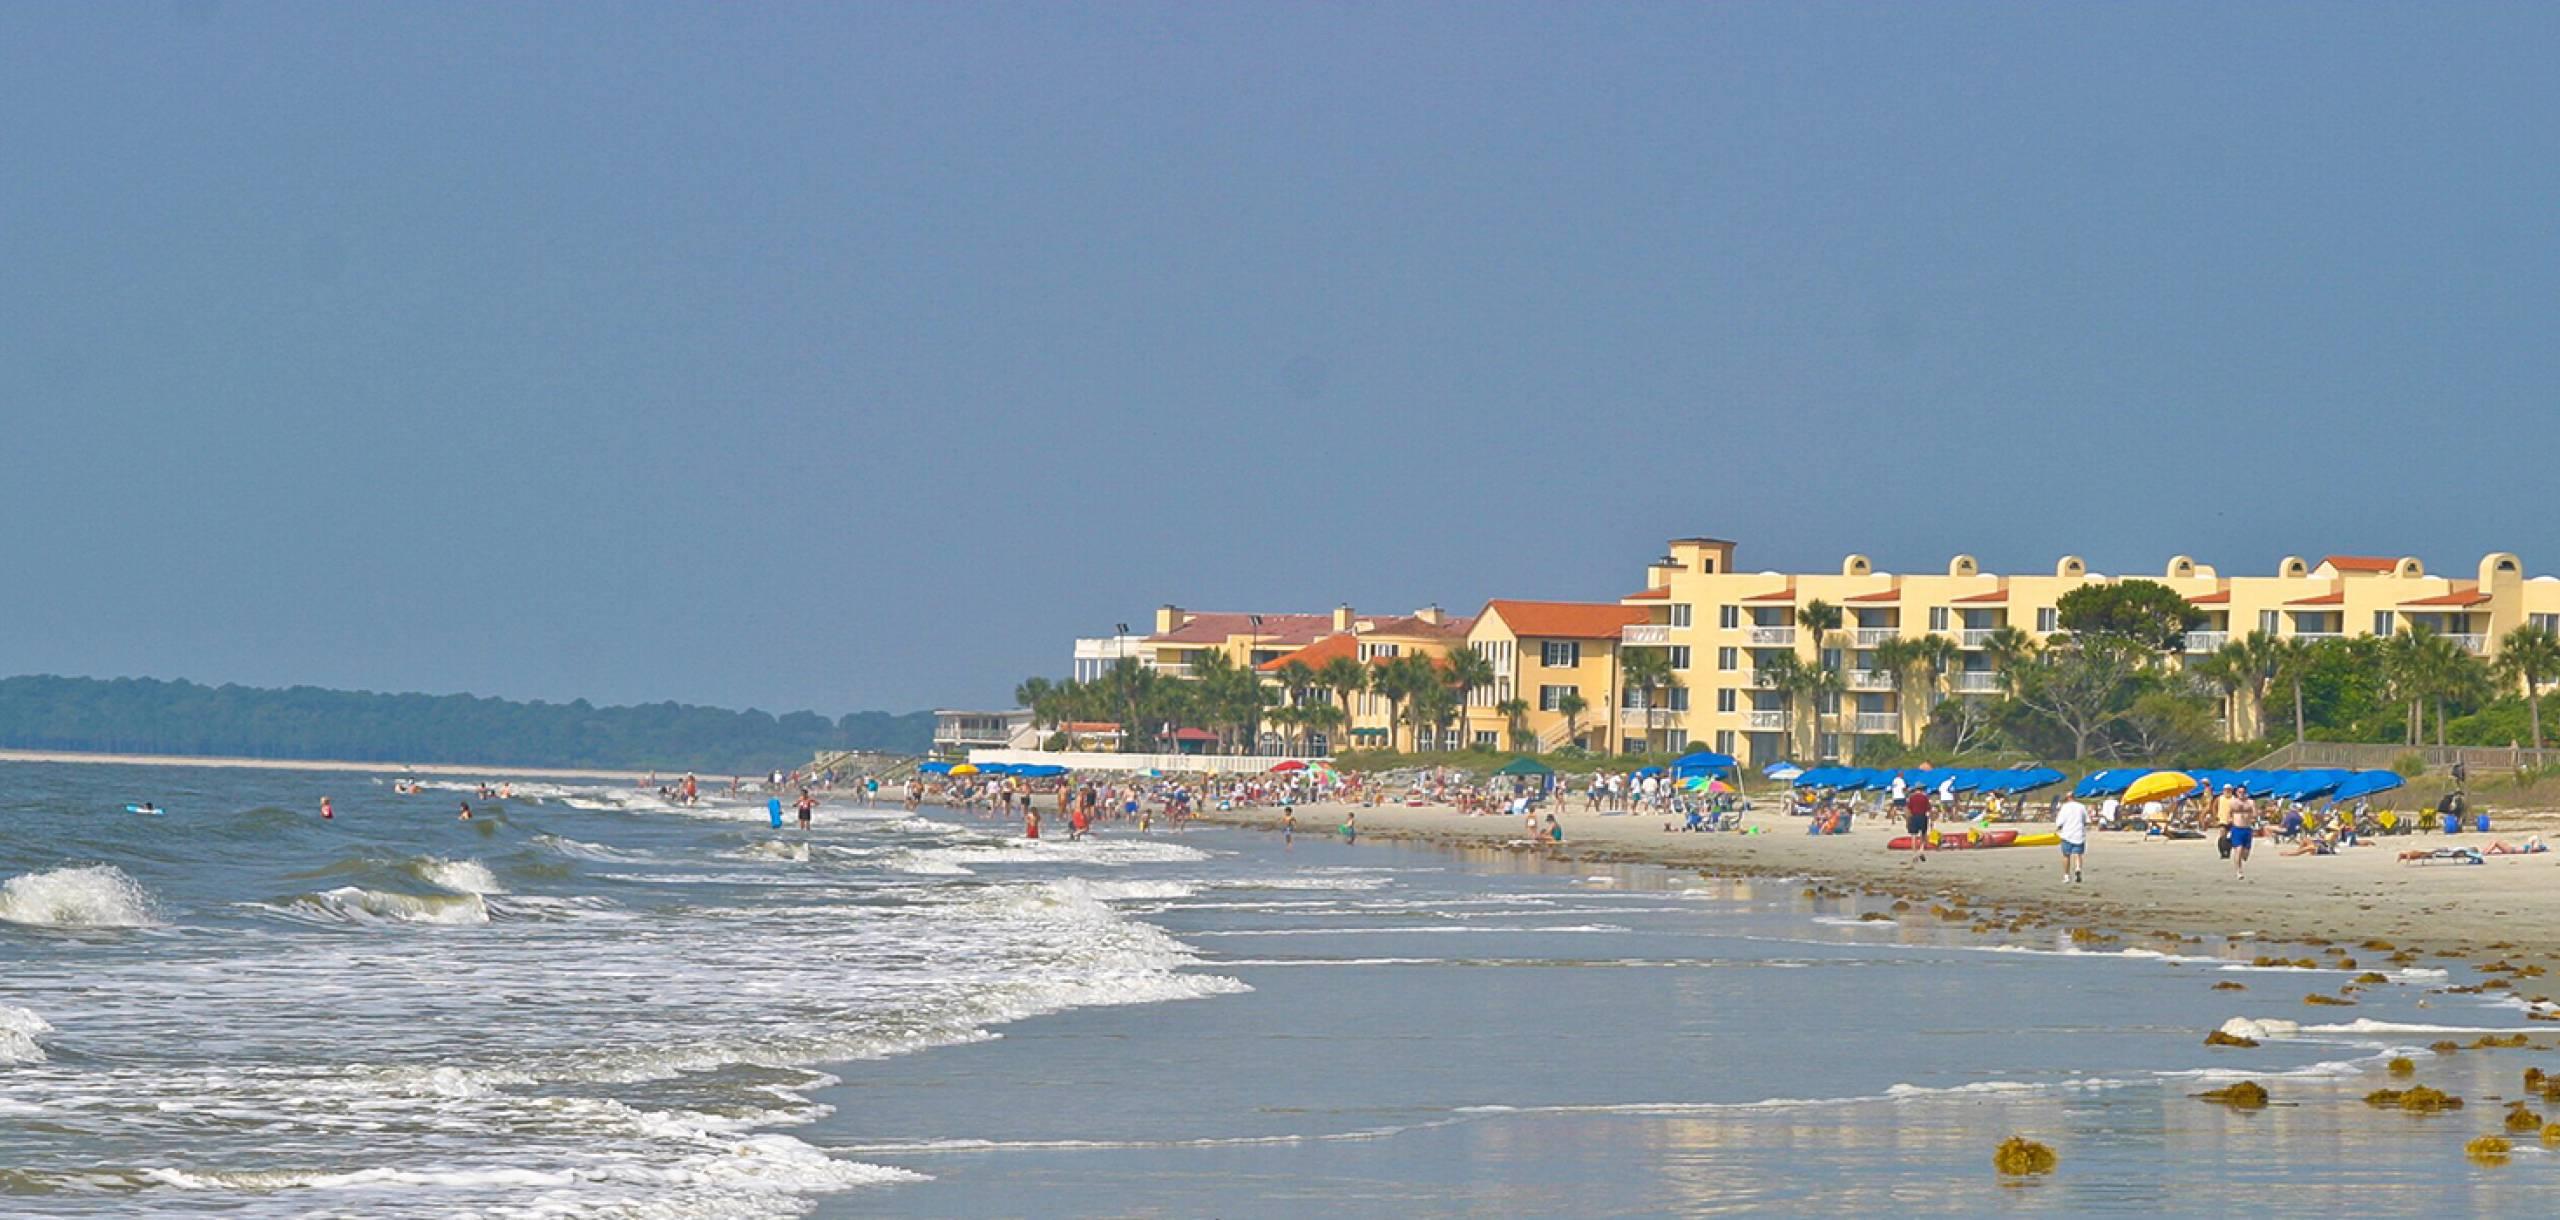 st simons island beach rentals